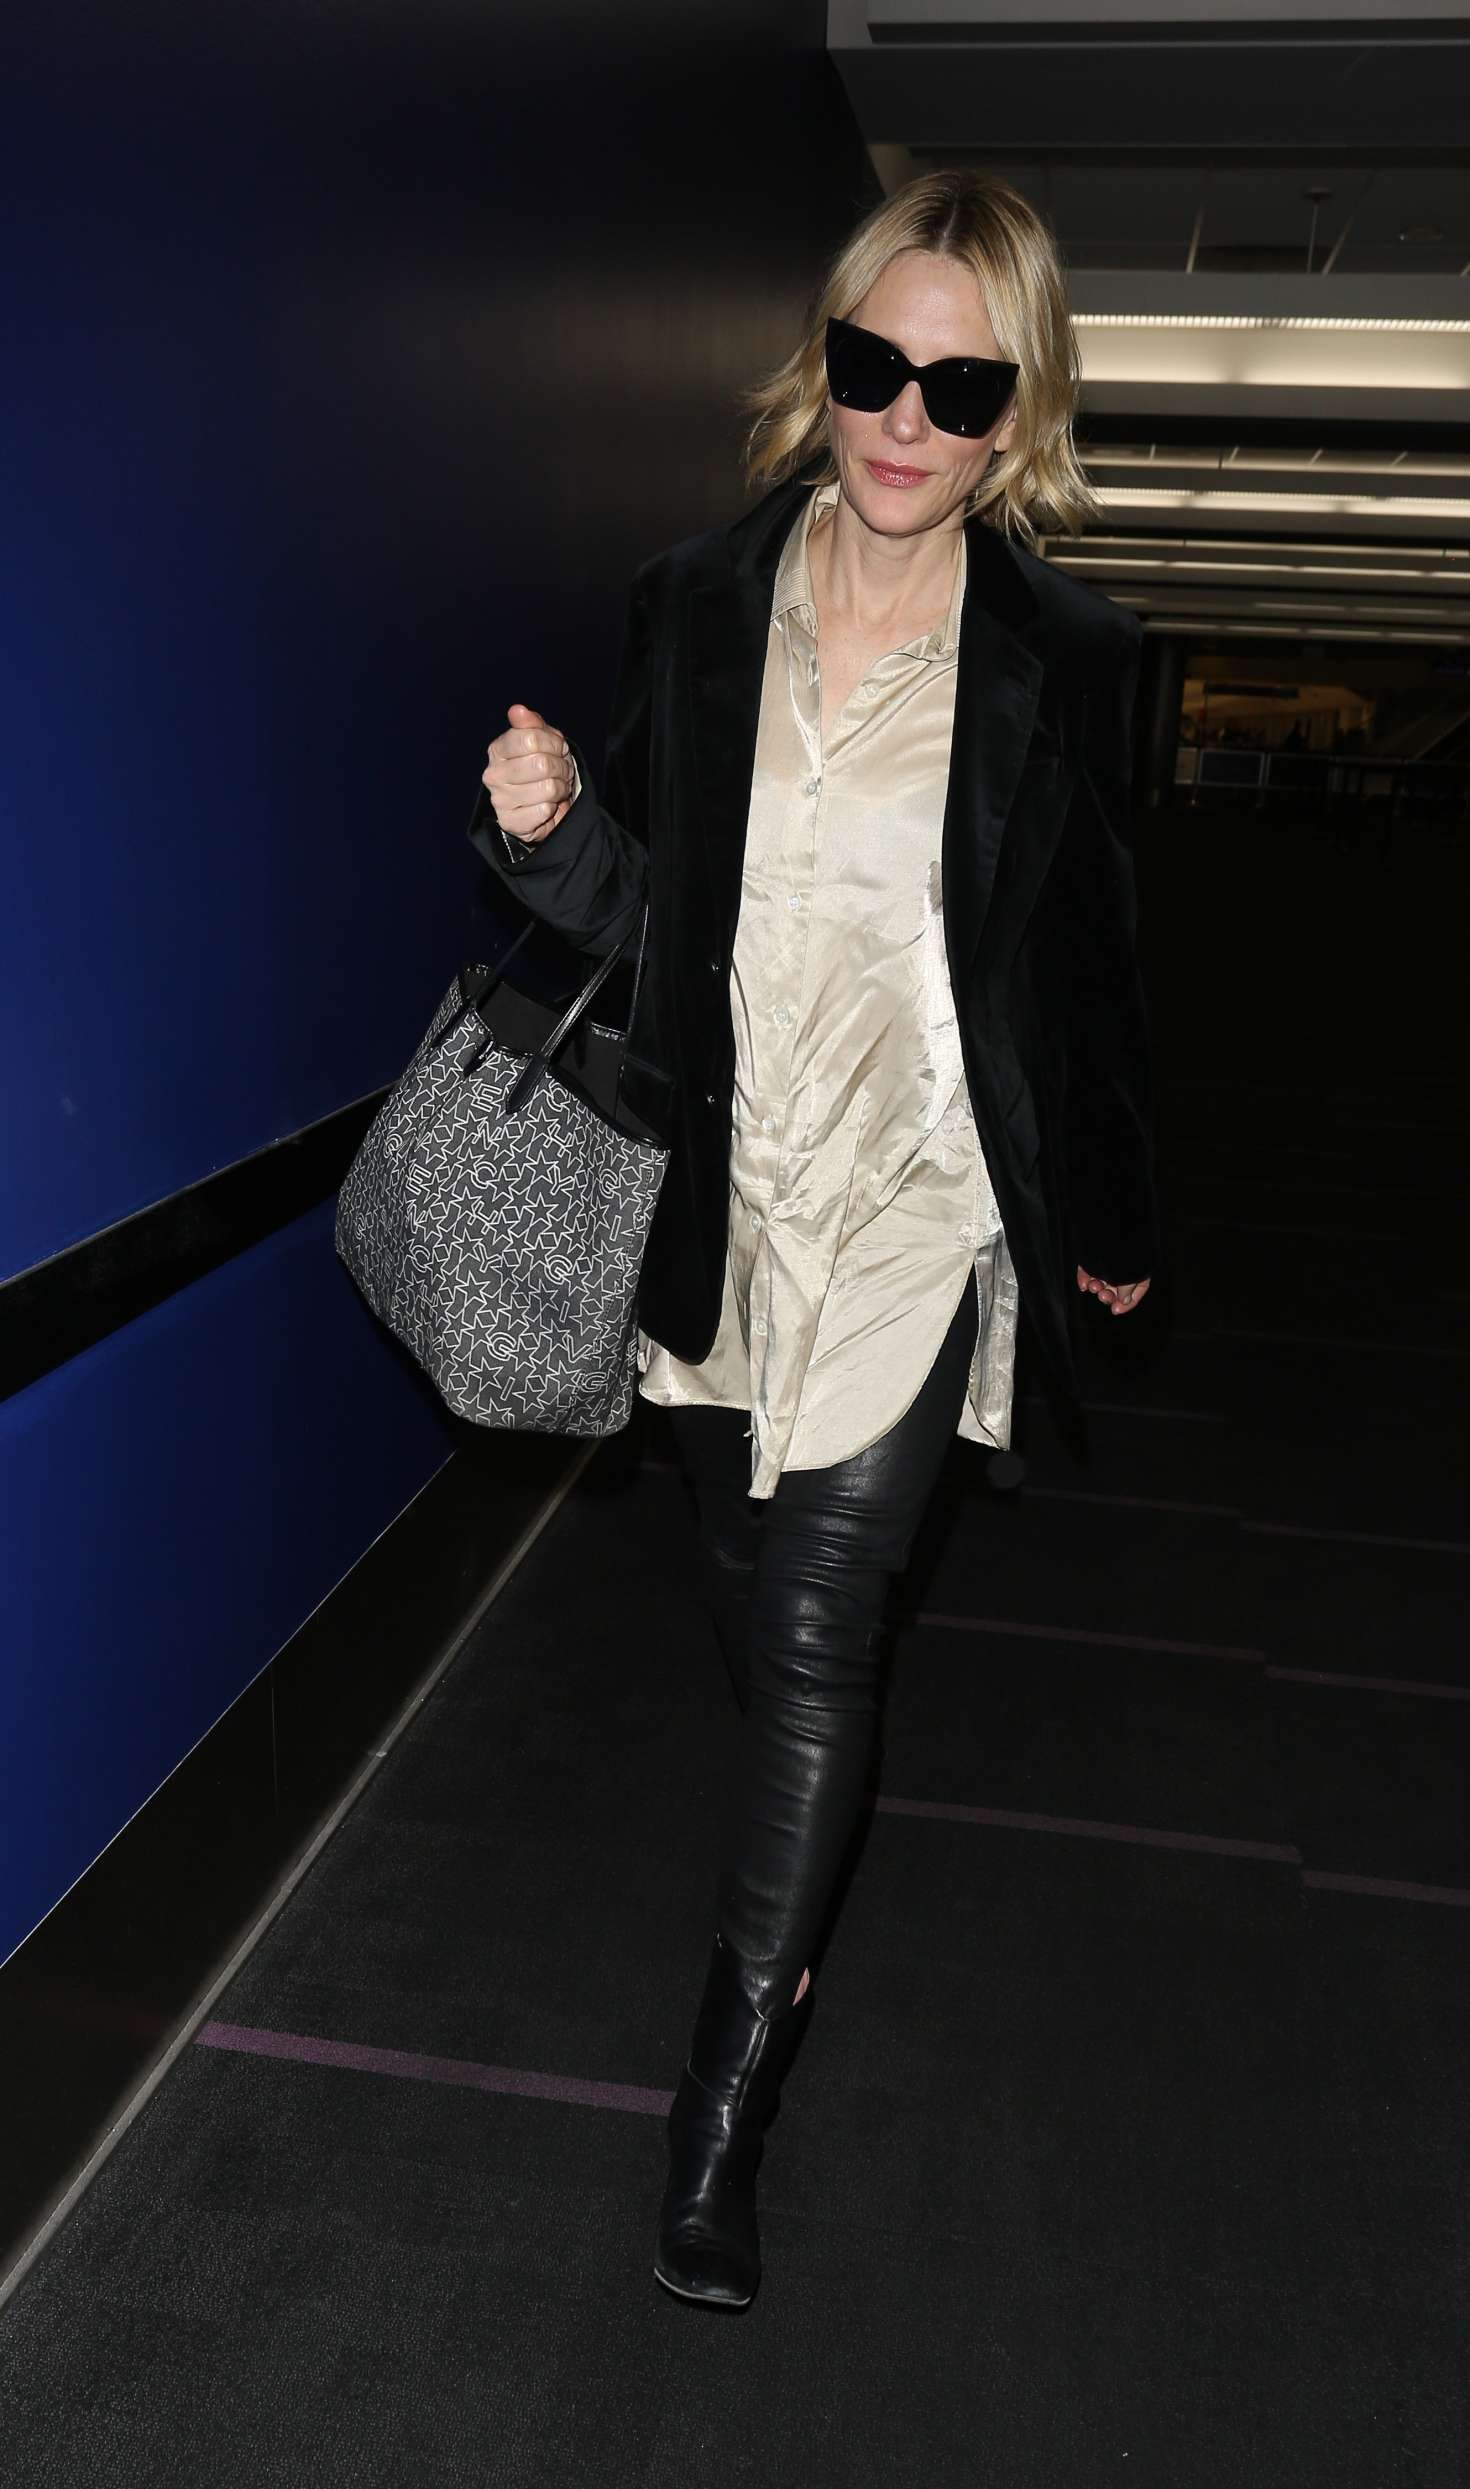 Cate Blanchett 2017 : Cate Blanchett at Los Angeles International Airport -13